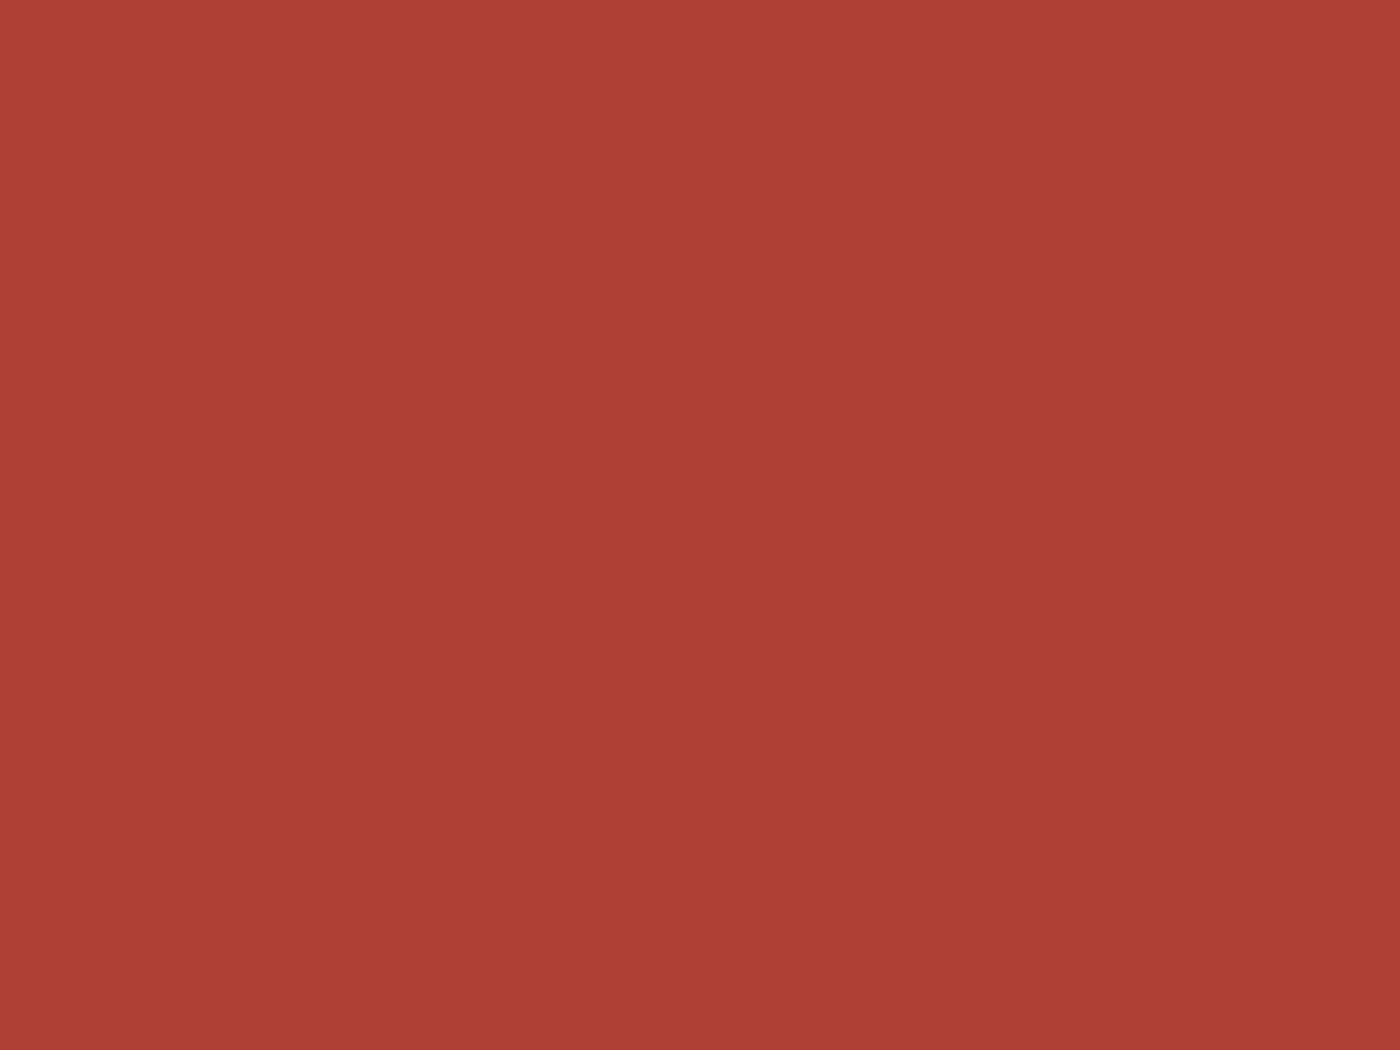 1400x1050 Pale Carmine Solid Color Background